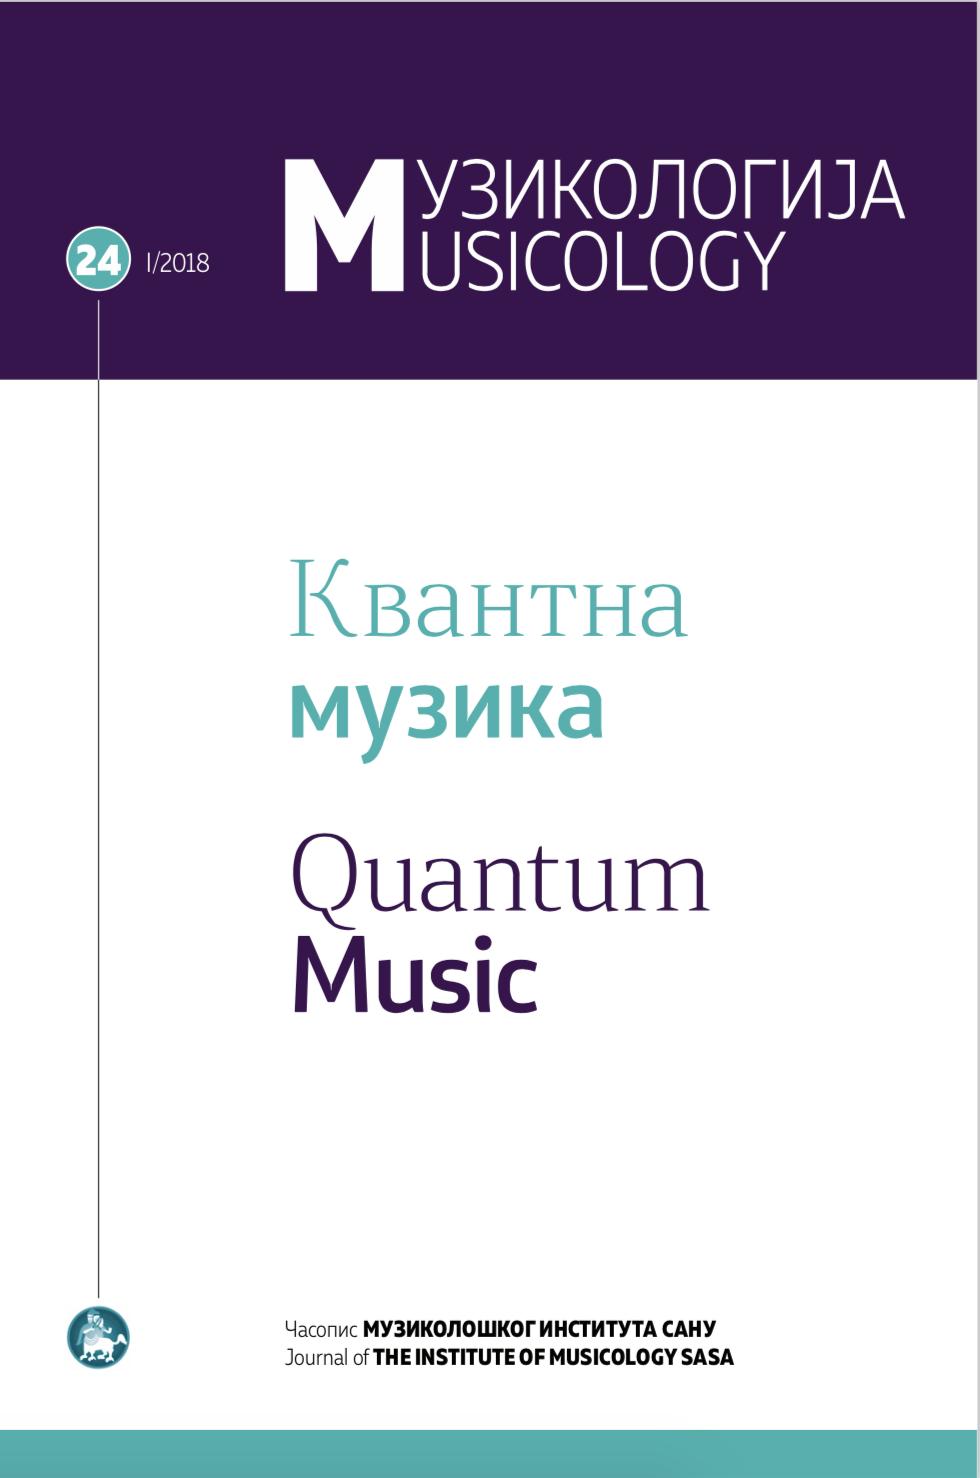 Musicology 24